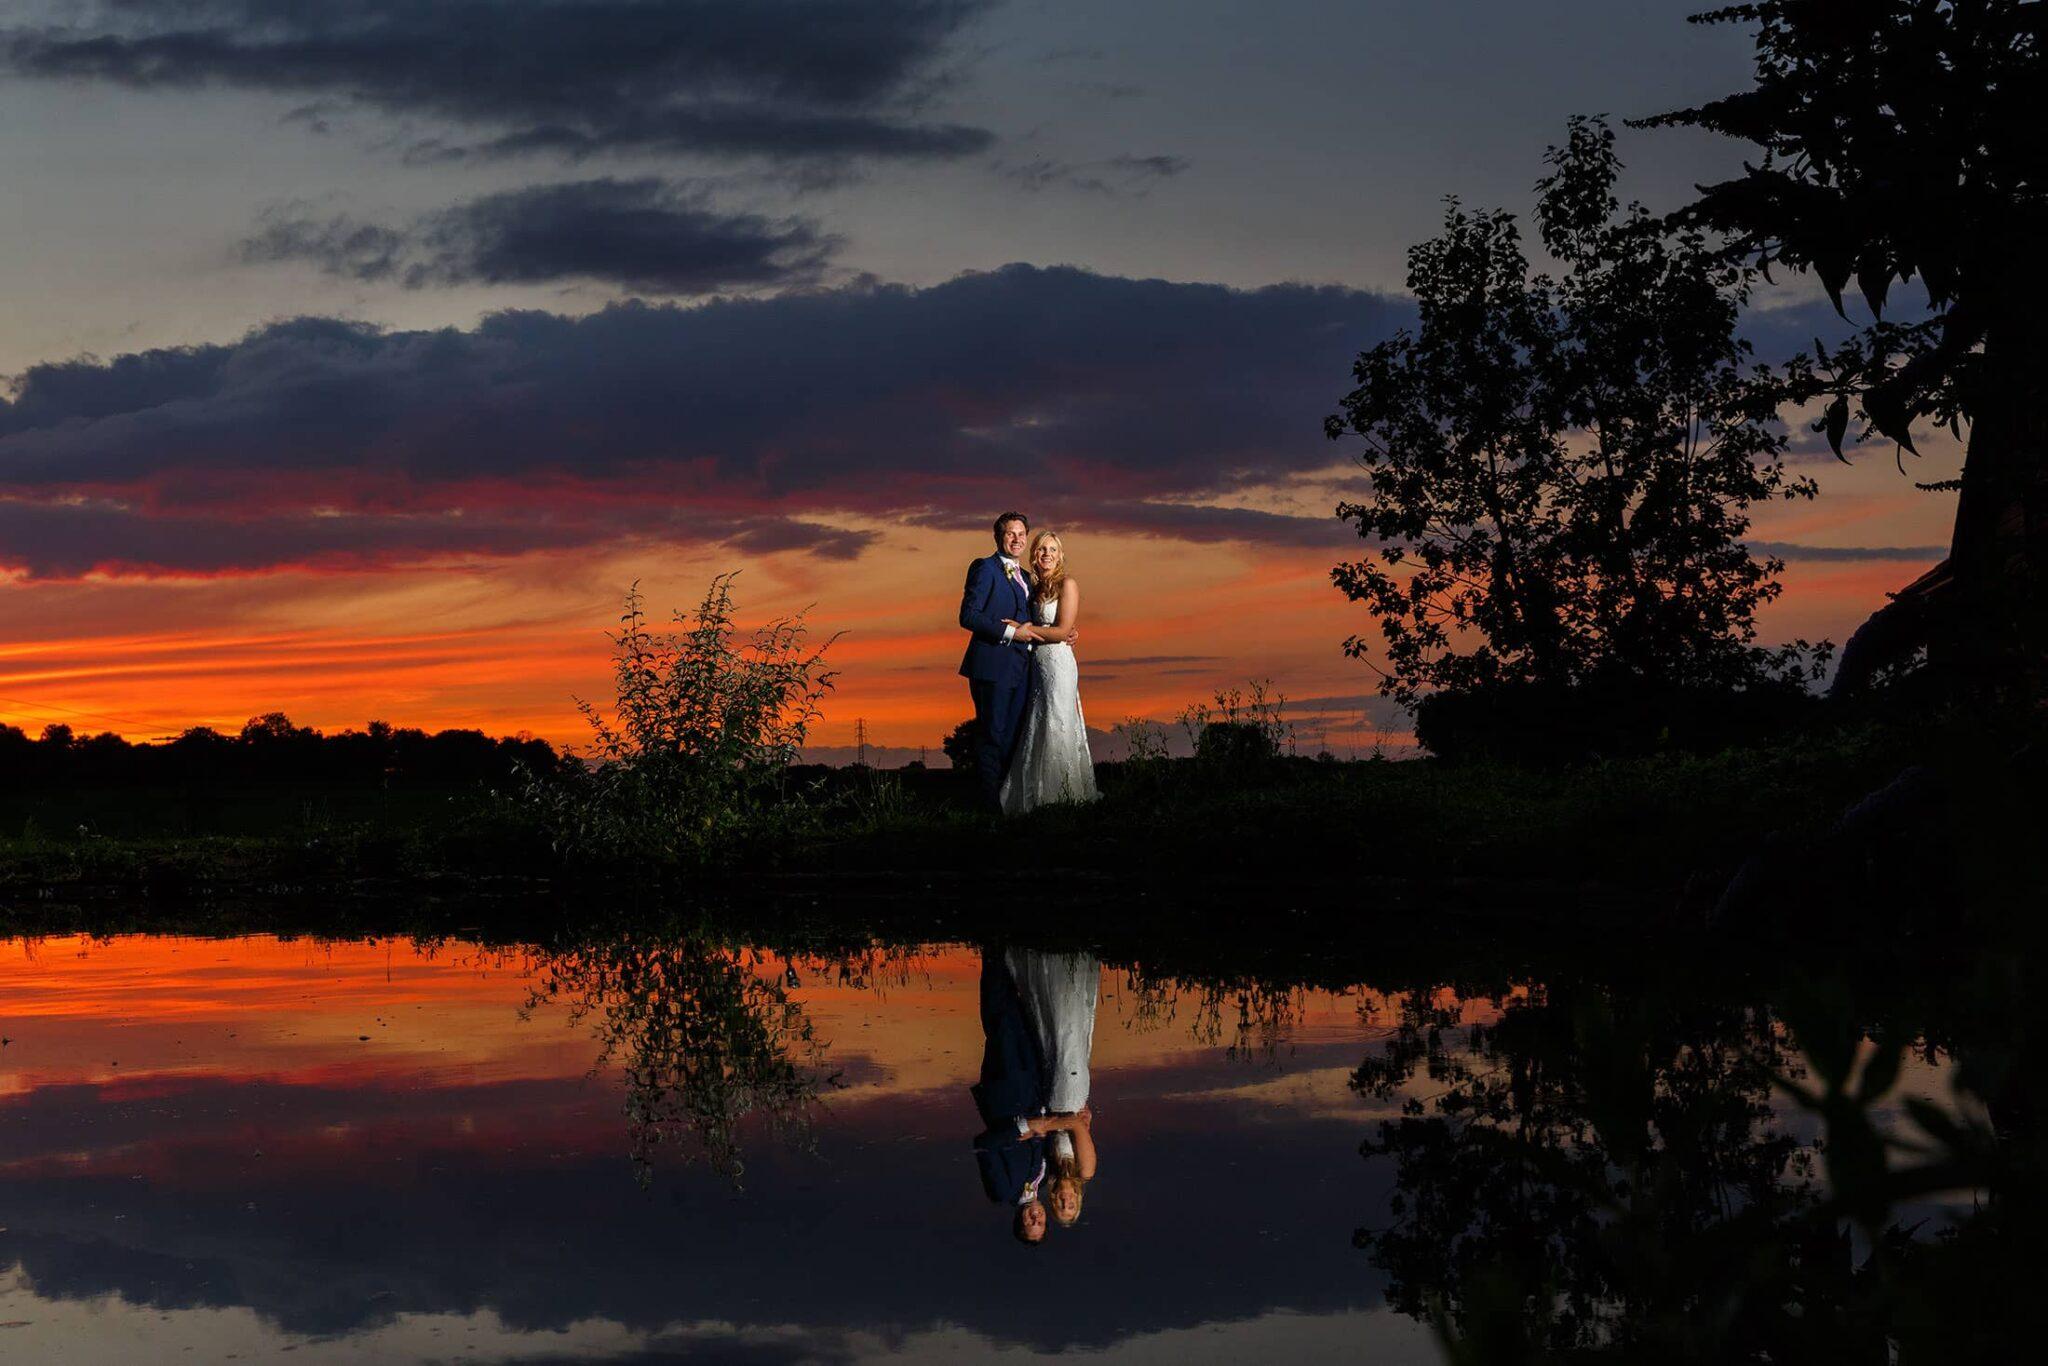 Barrandov Opera wedding photography of Kate & Ryan